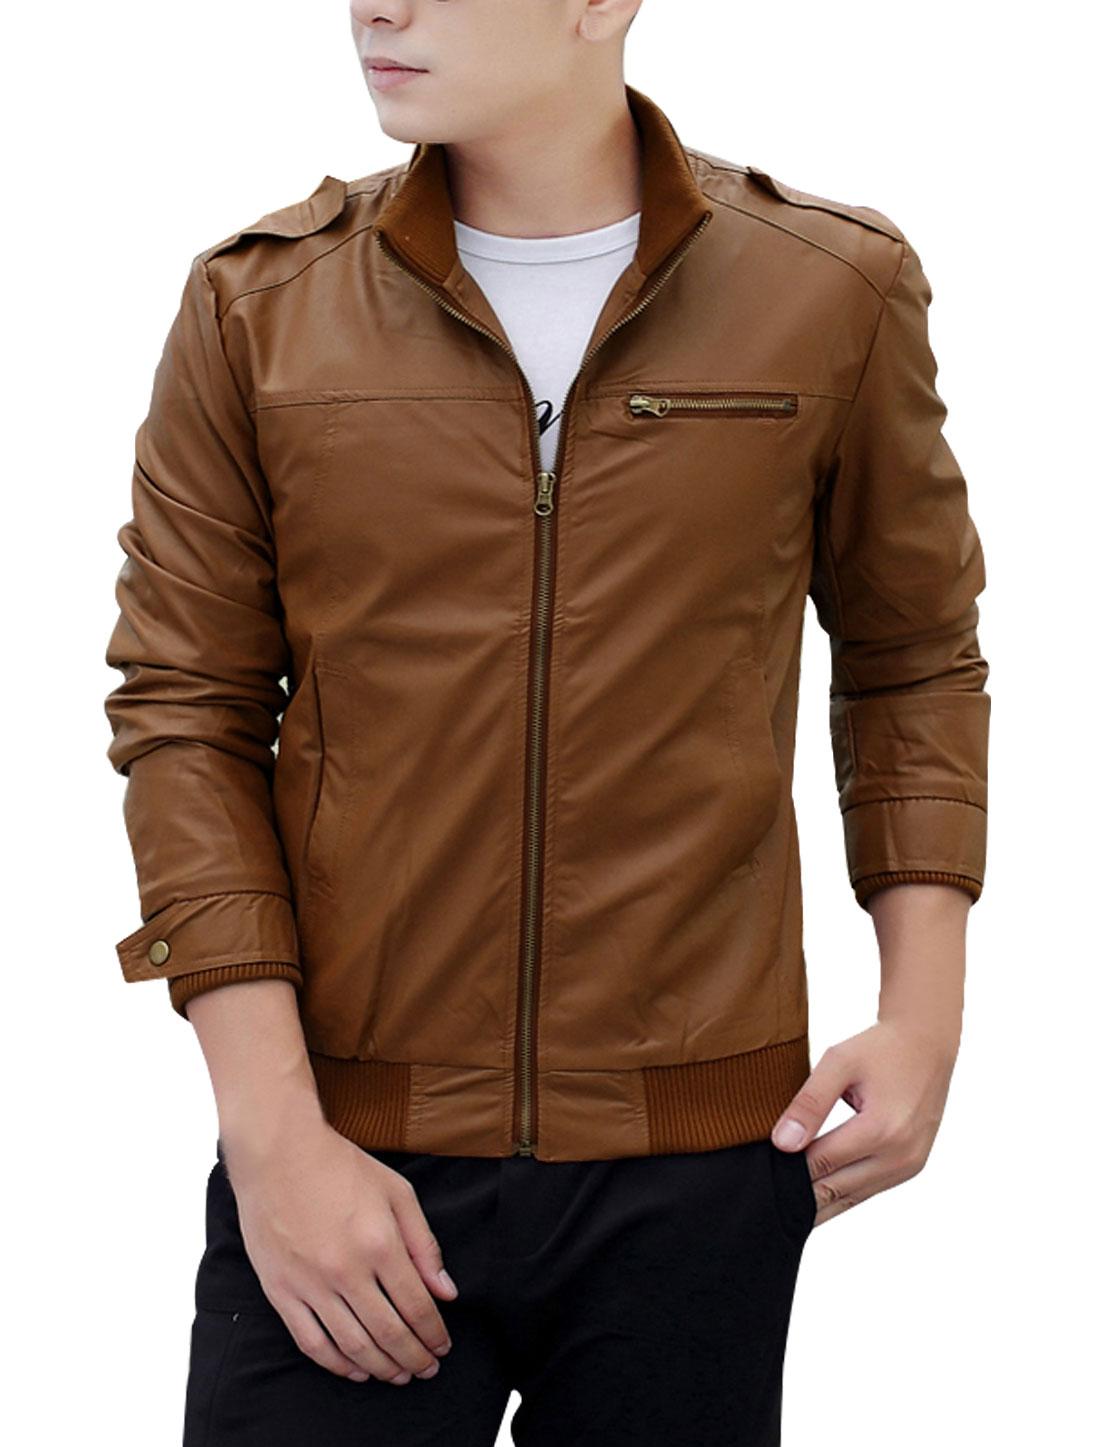 Men Stand Collar Slant Pockets Slim Fit PU Jacket Brown M